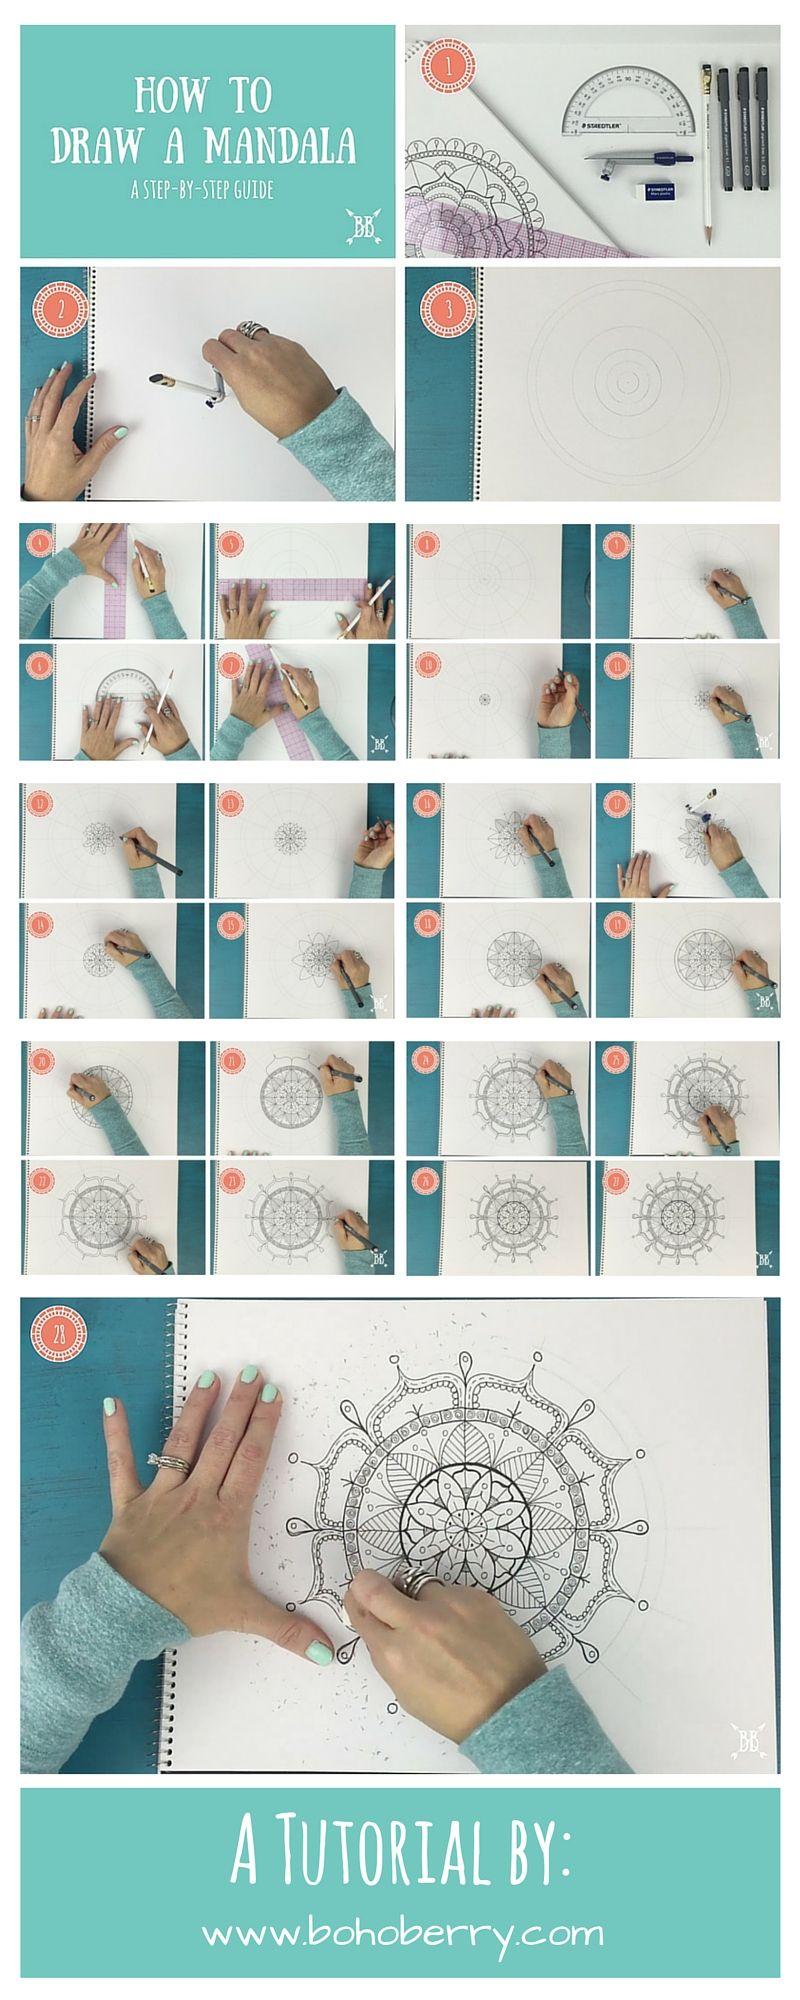 How to draw a mandala a stepbystep guide step guide mandala